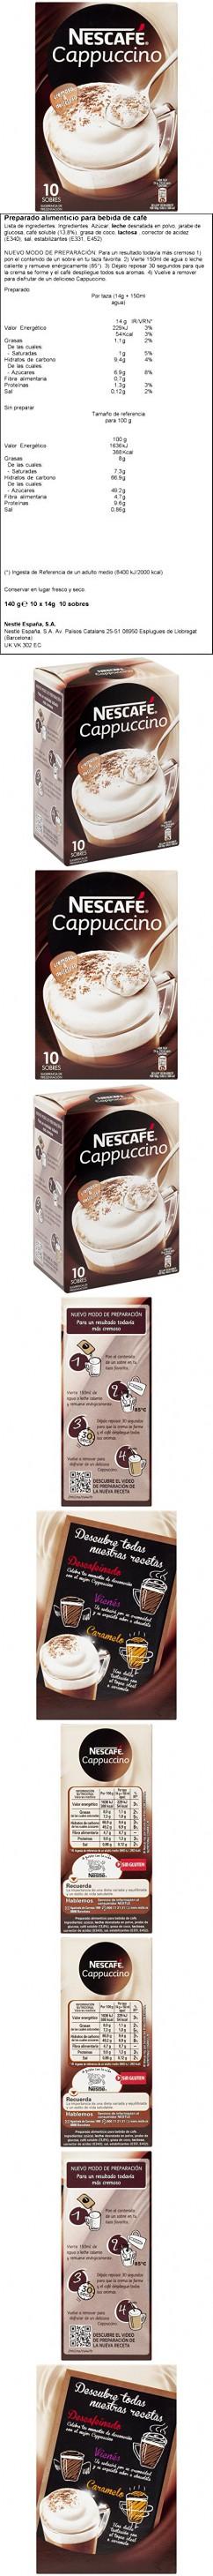 Nescafe Cappucino Packets 14g 10 ct Nescafe, Instant